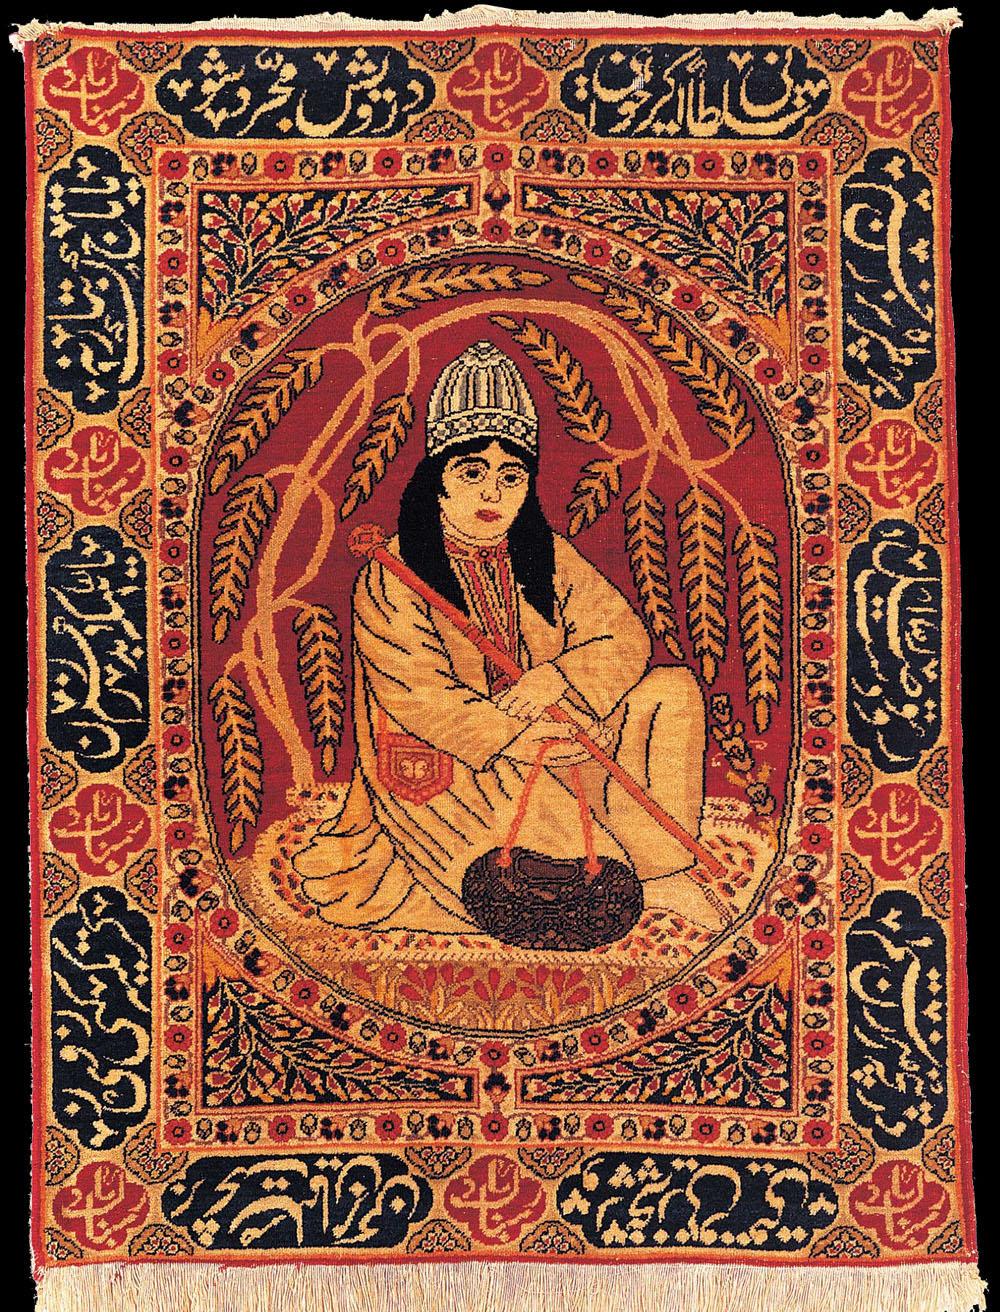 Antique Tabriz Pictorial Rug Dervish Azerbaijan Late